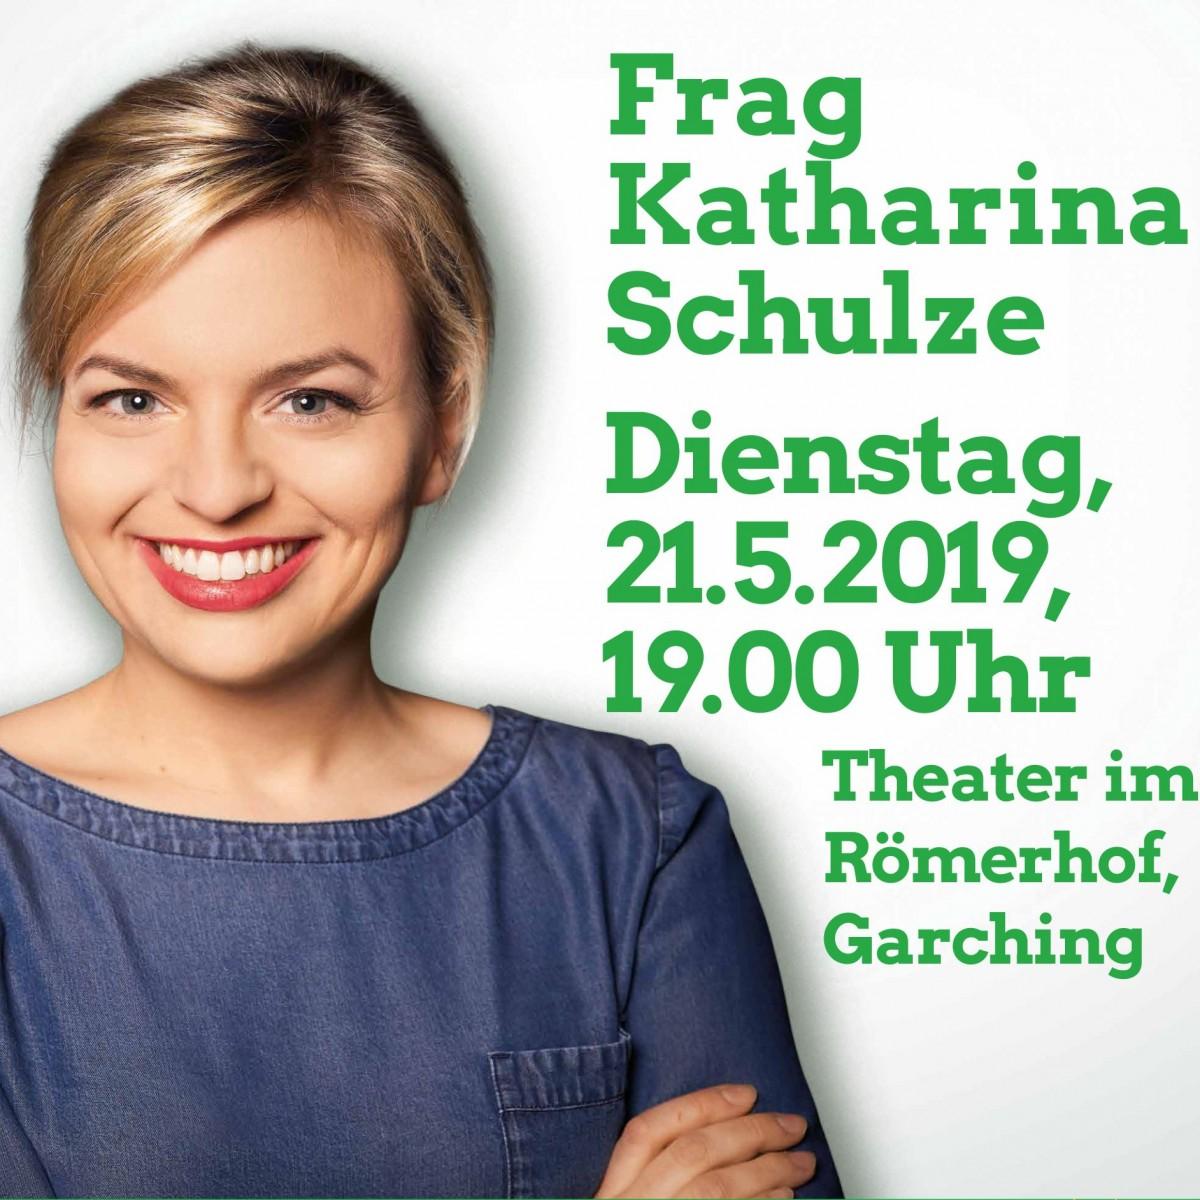 FragKatharinaSchulze